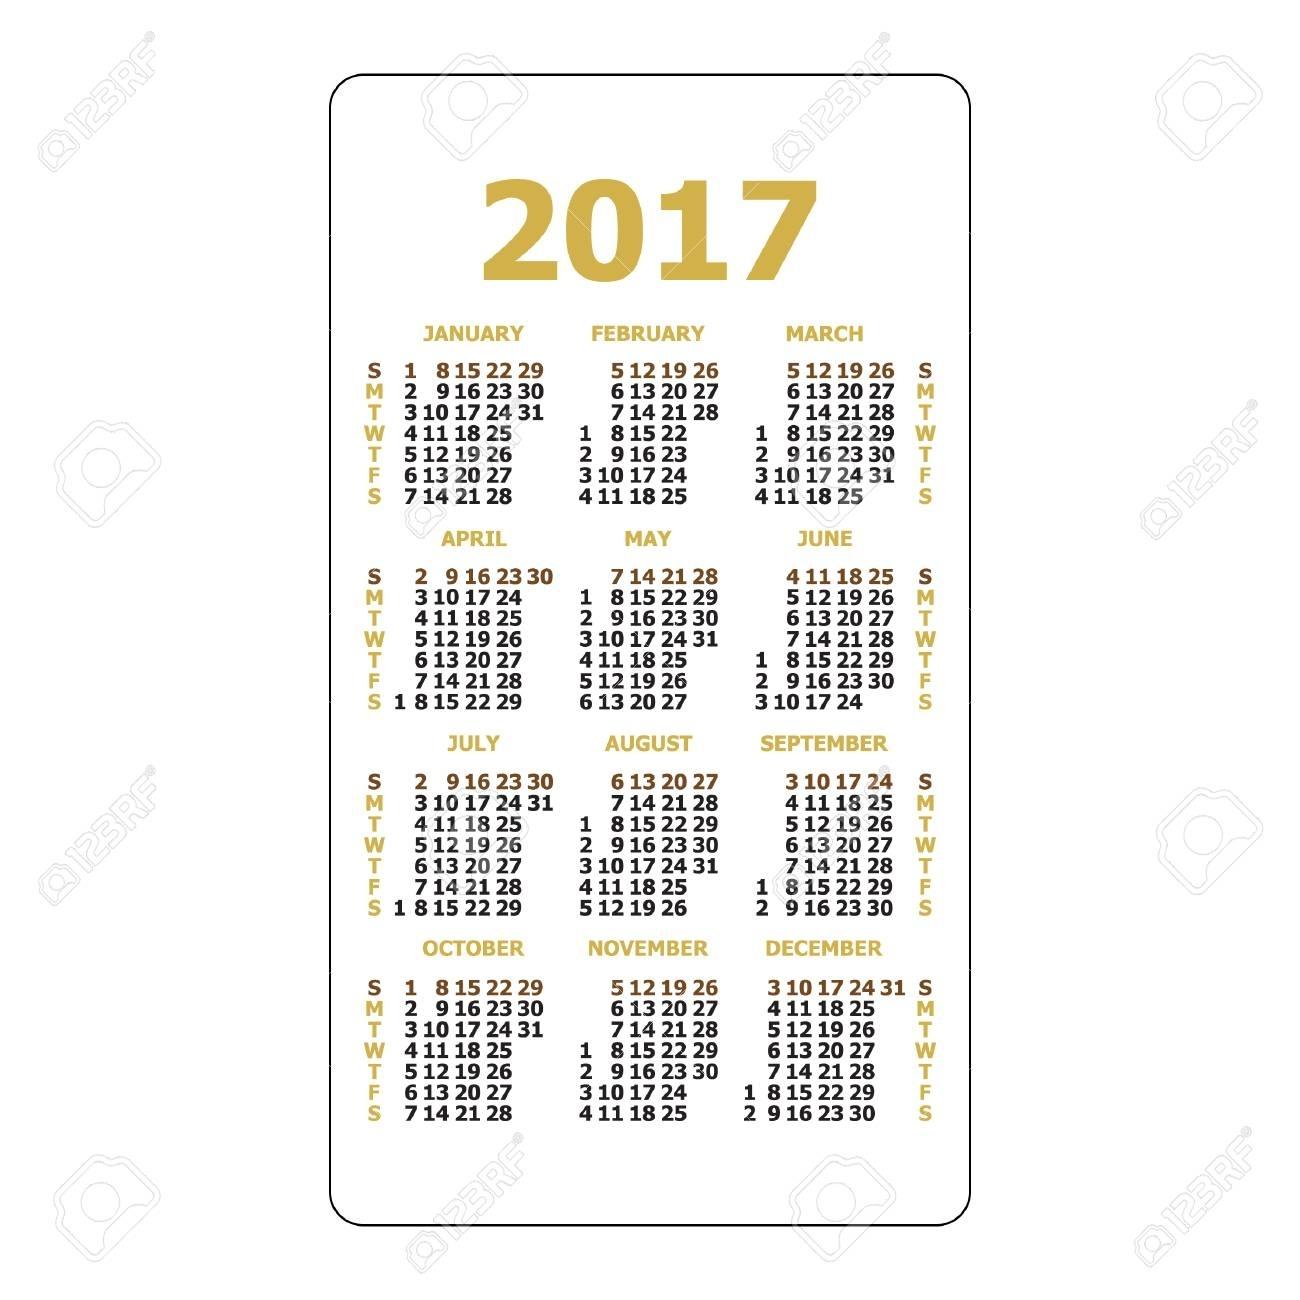 2017 Pocket Calendar. Template Calendar Grid. Vertical Orientation regarding Grid Of 31 Days Image